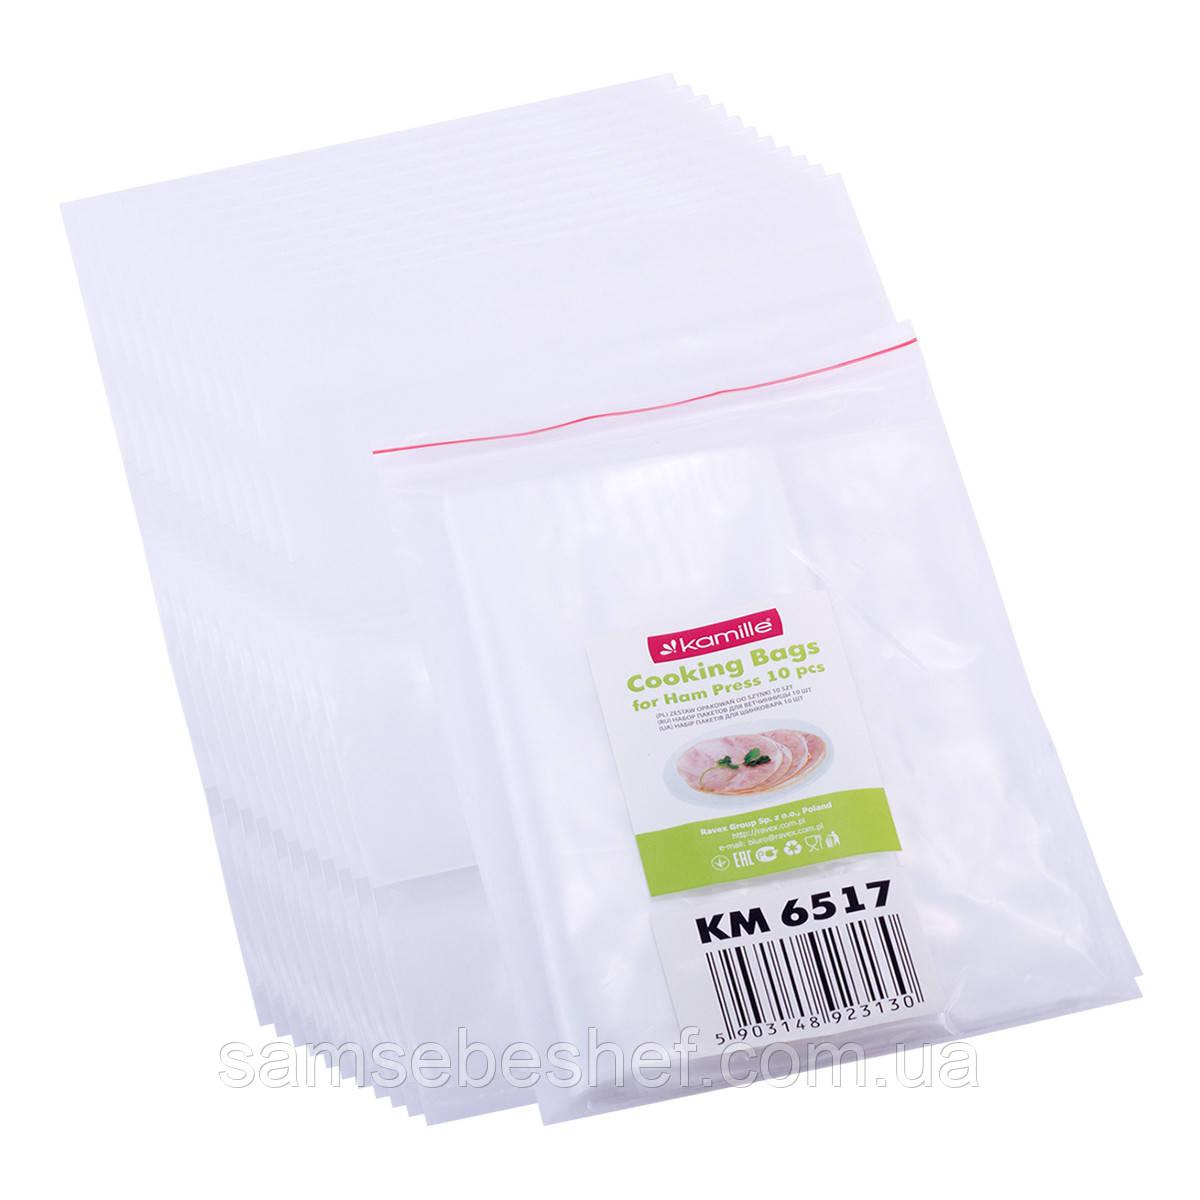 Набір пакетів для ветчинницы Kamille 2,5 л. (10шт)